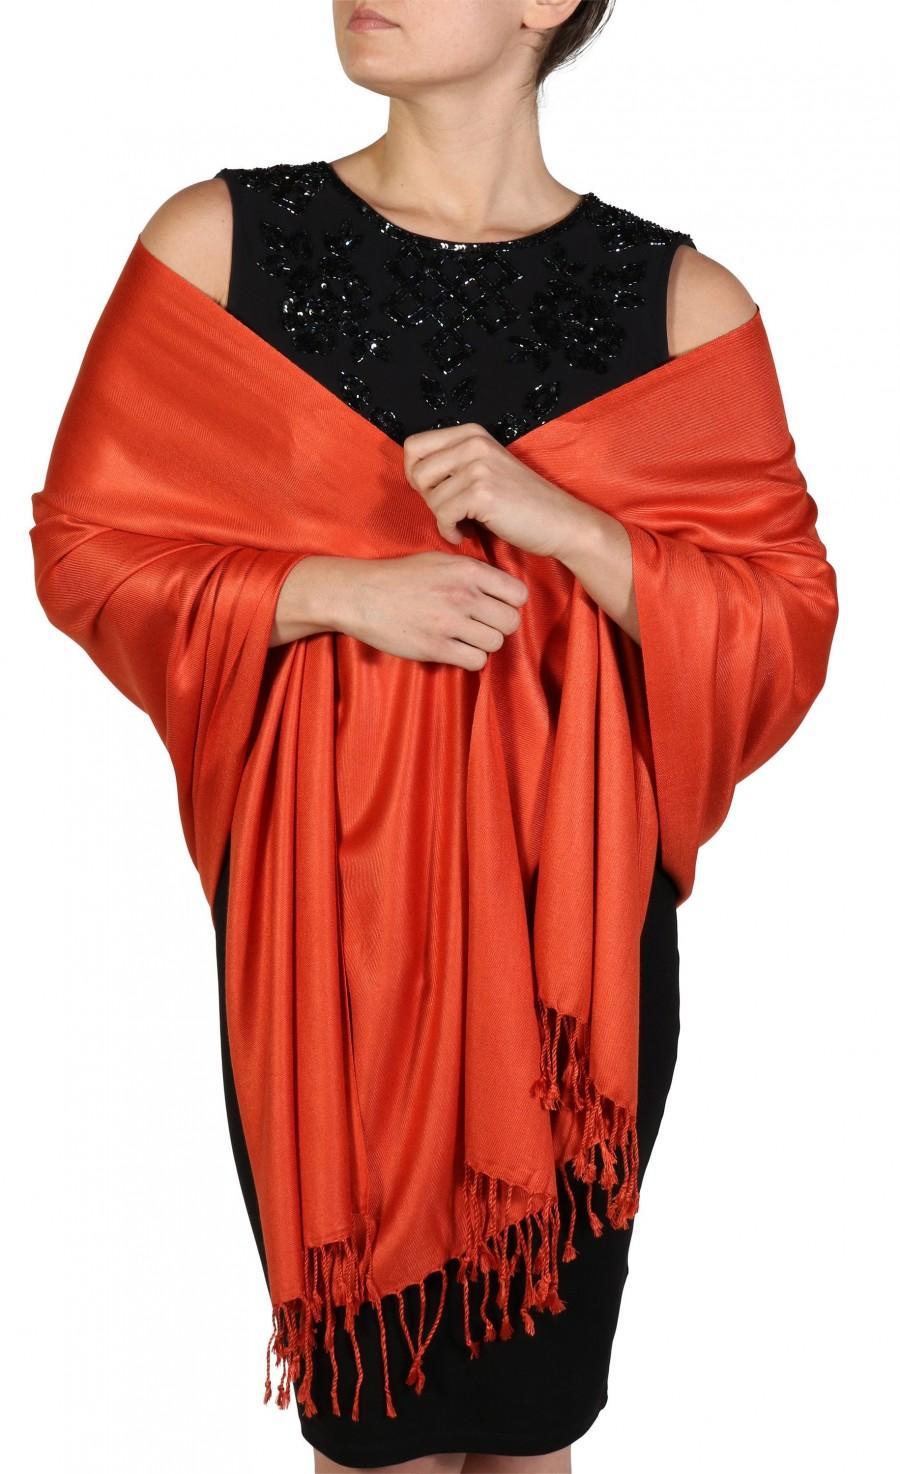 Wedding - Burnt Orange Shawl, Rust Pashmina, Fairtrade Shawl, Orange Bridal Wrap, Wedding Pashmina, Scarves and Wraps, Gifts For Women, York Scarves